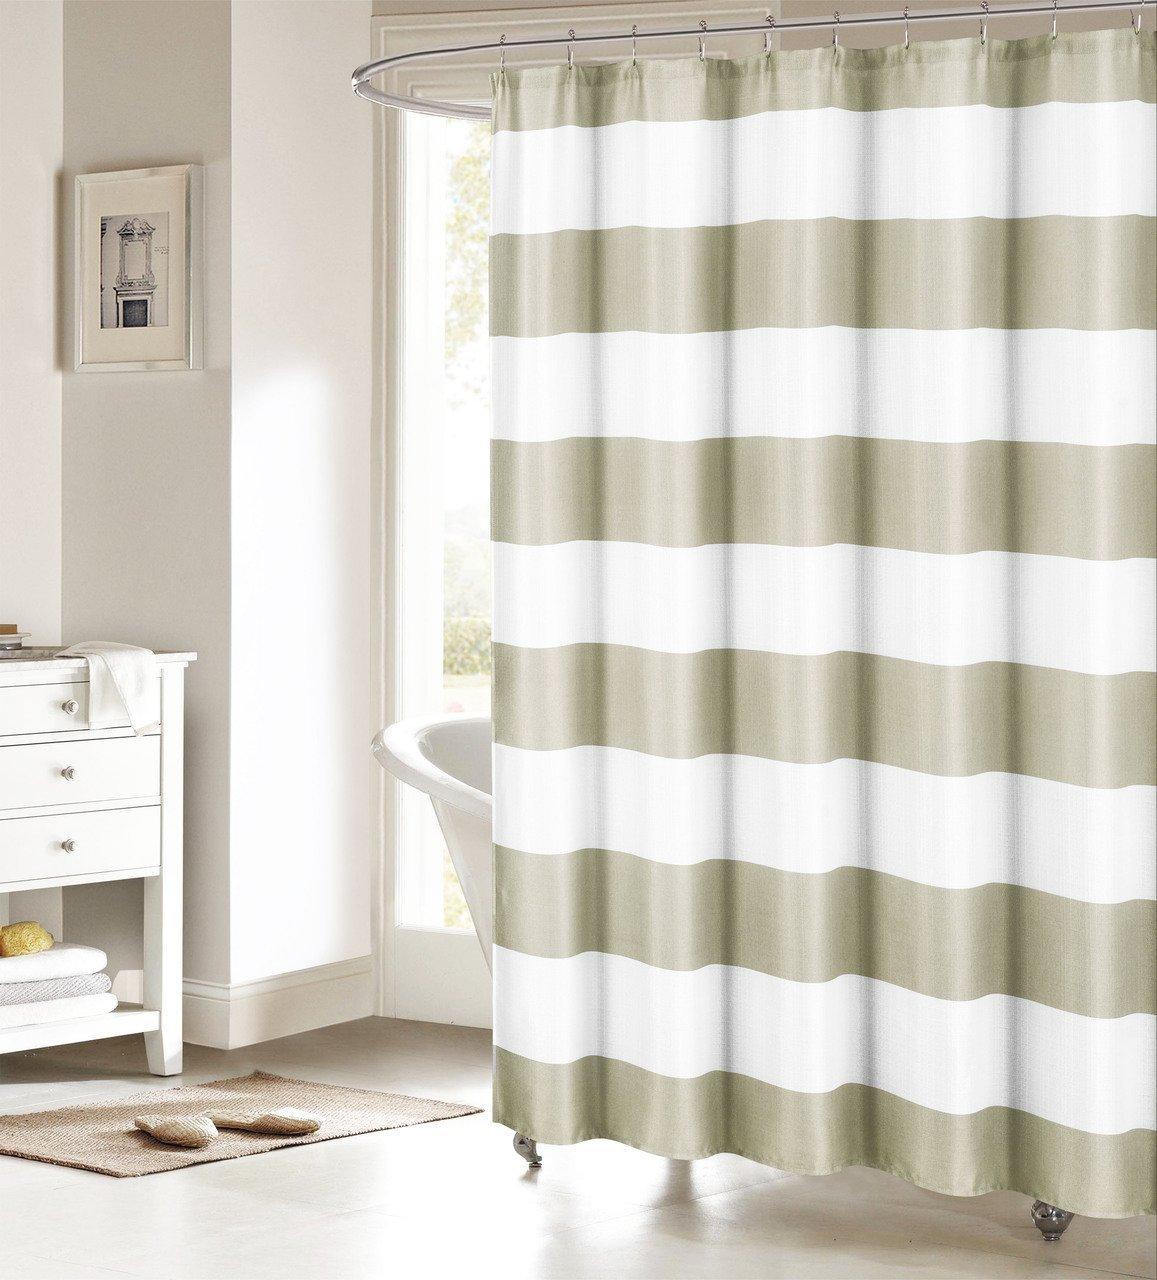 Memory Home Fabric Shower Curtain Nautical Stripe Design Sand and ...